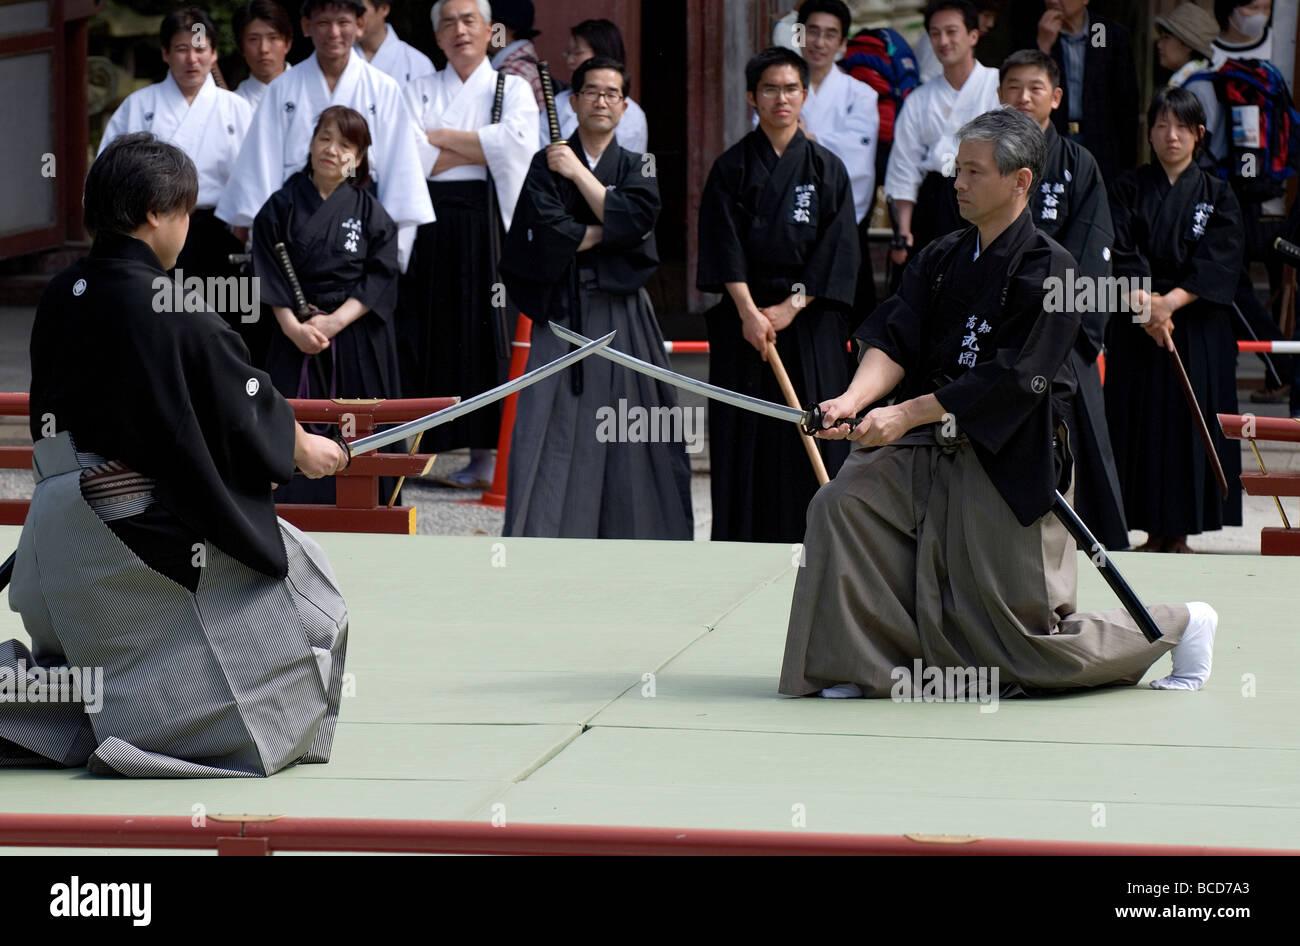 Two men sparring with real swords during a swordsmanship